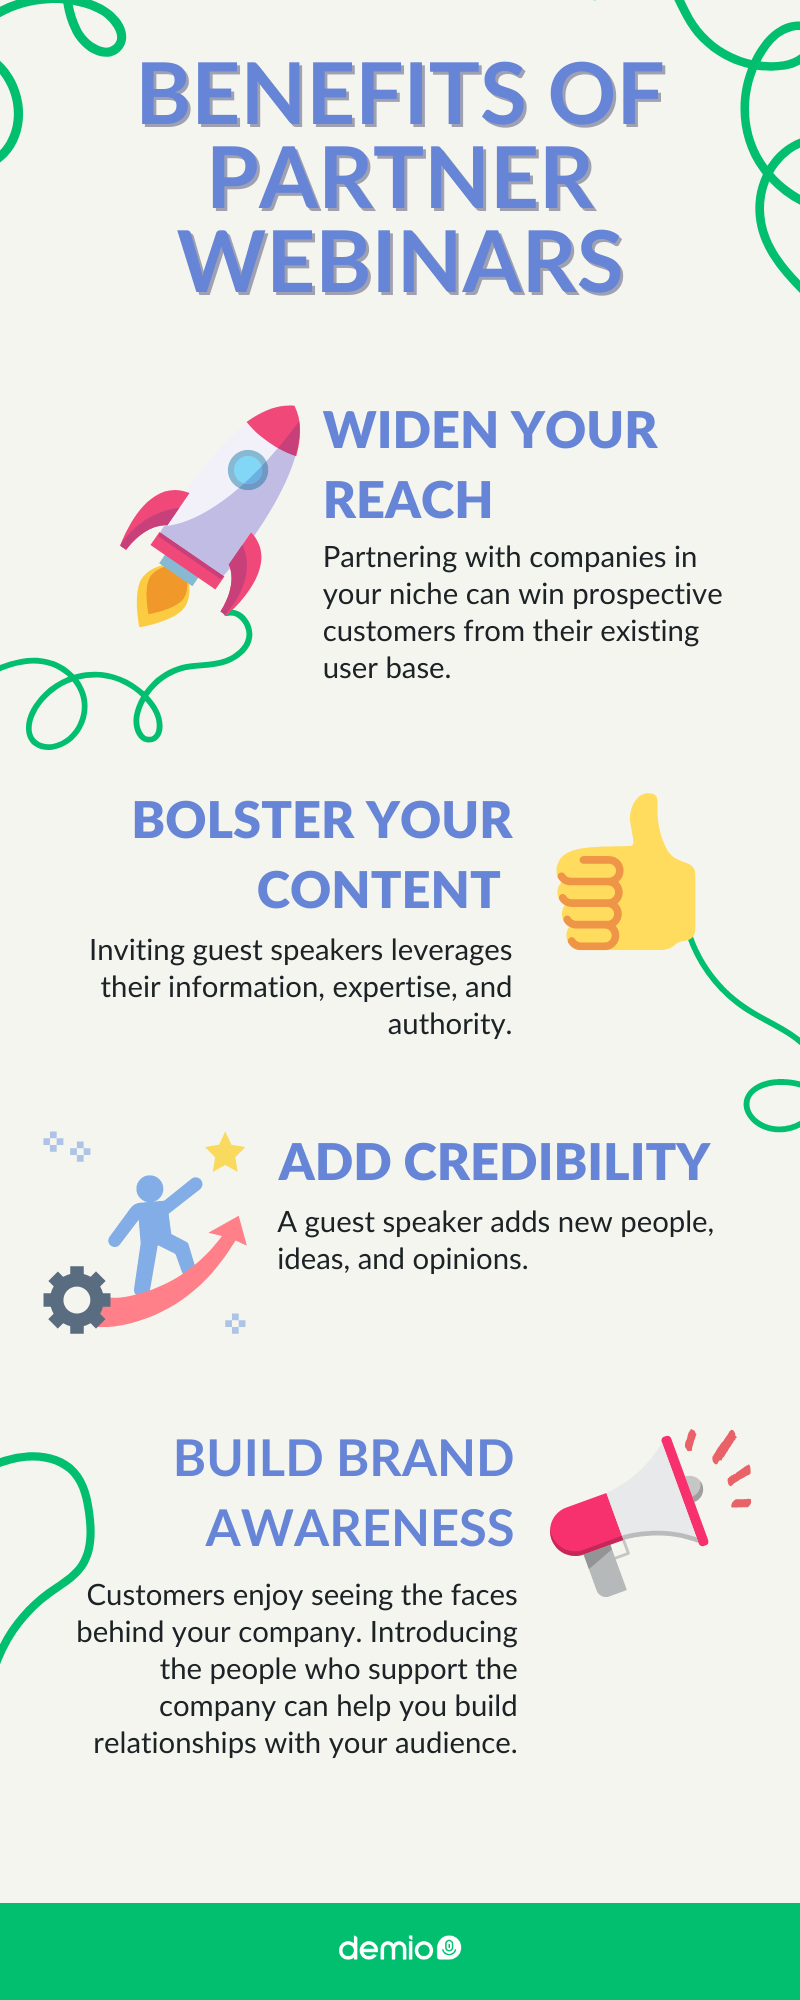 Benefits of partner webinars